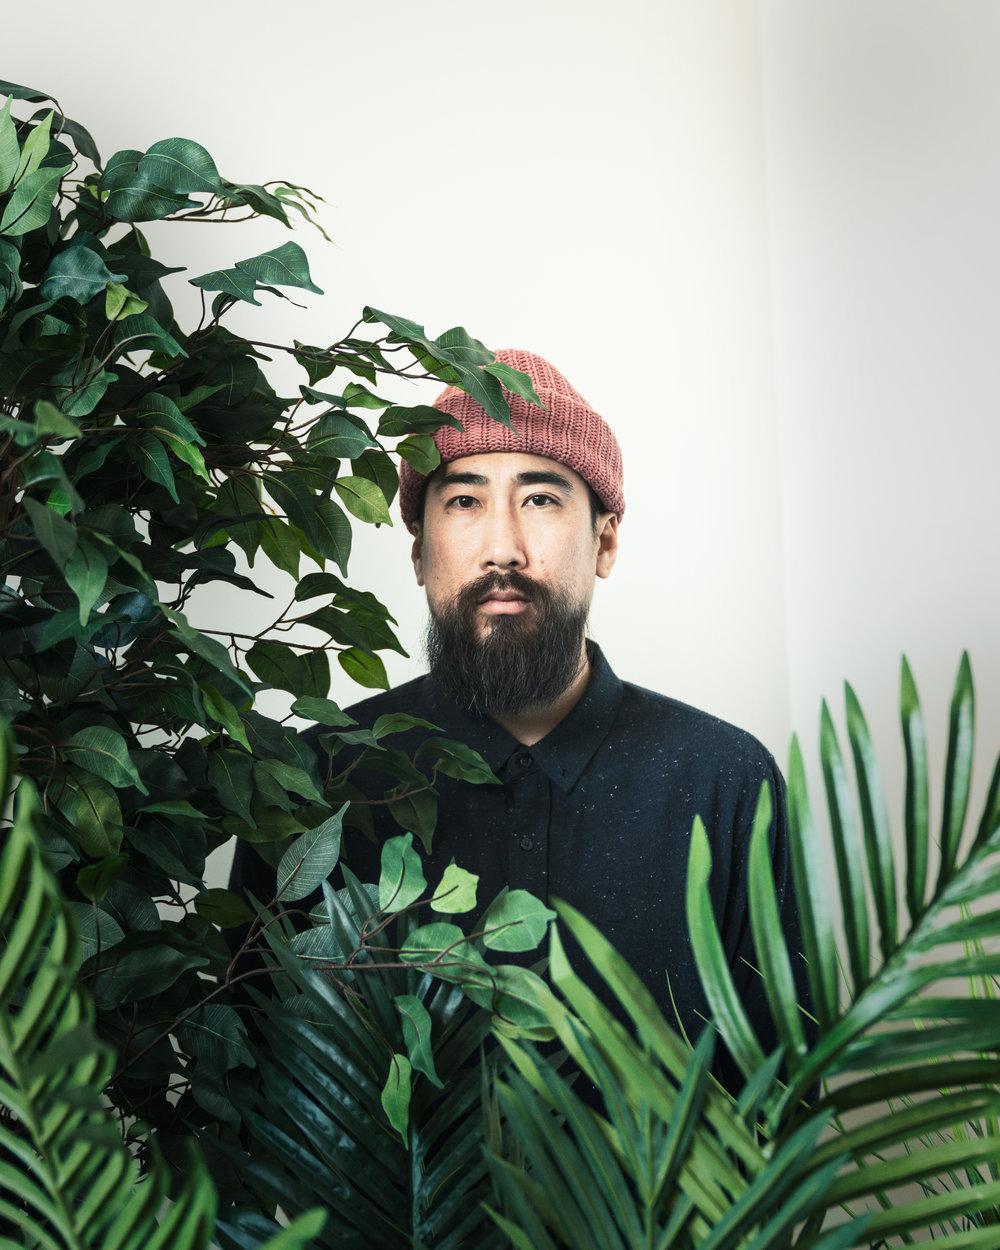 ryan feng justfeng sexy asian men beard self portrait.jpg